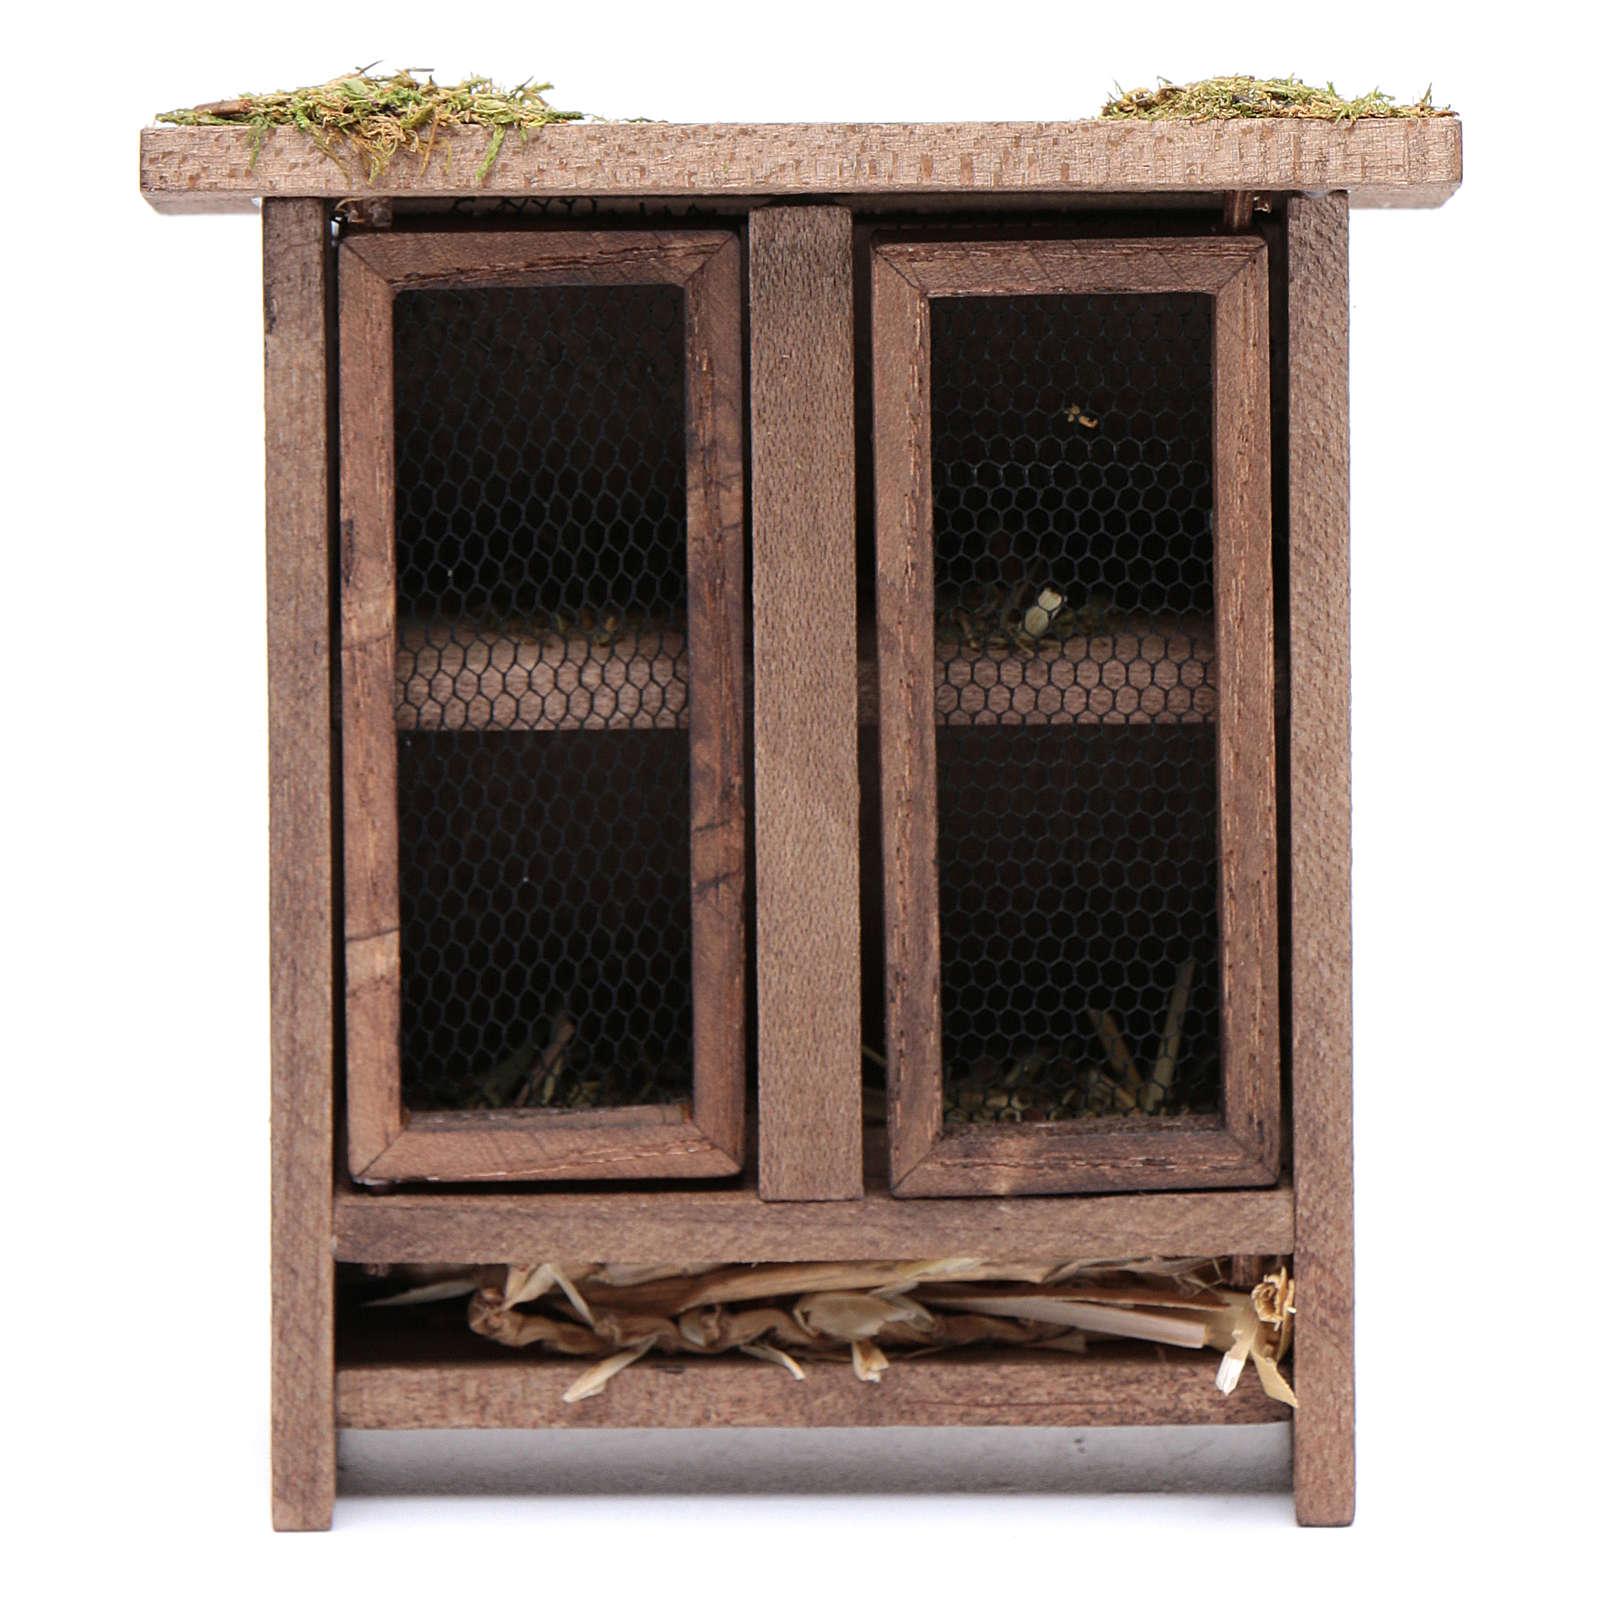 Rabbit hutch for nativity scene 3